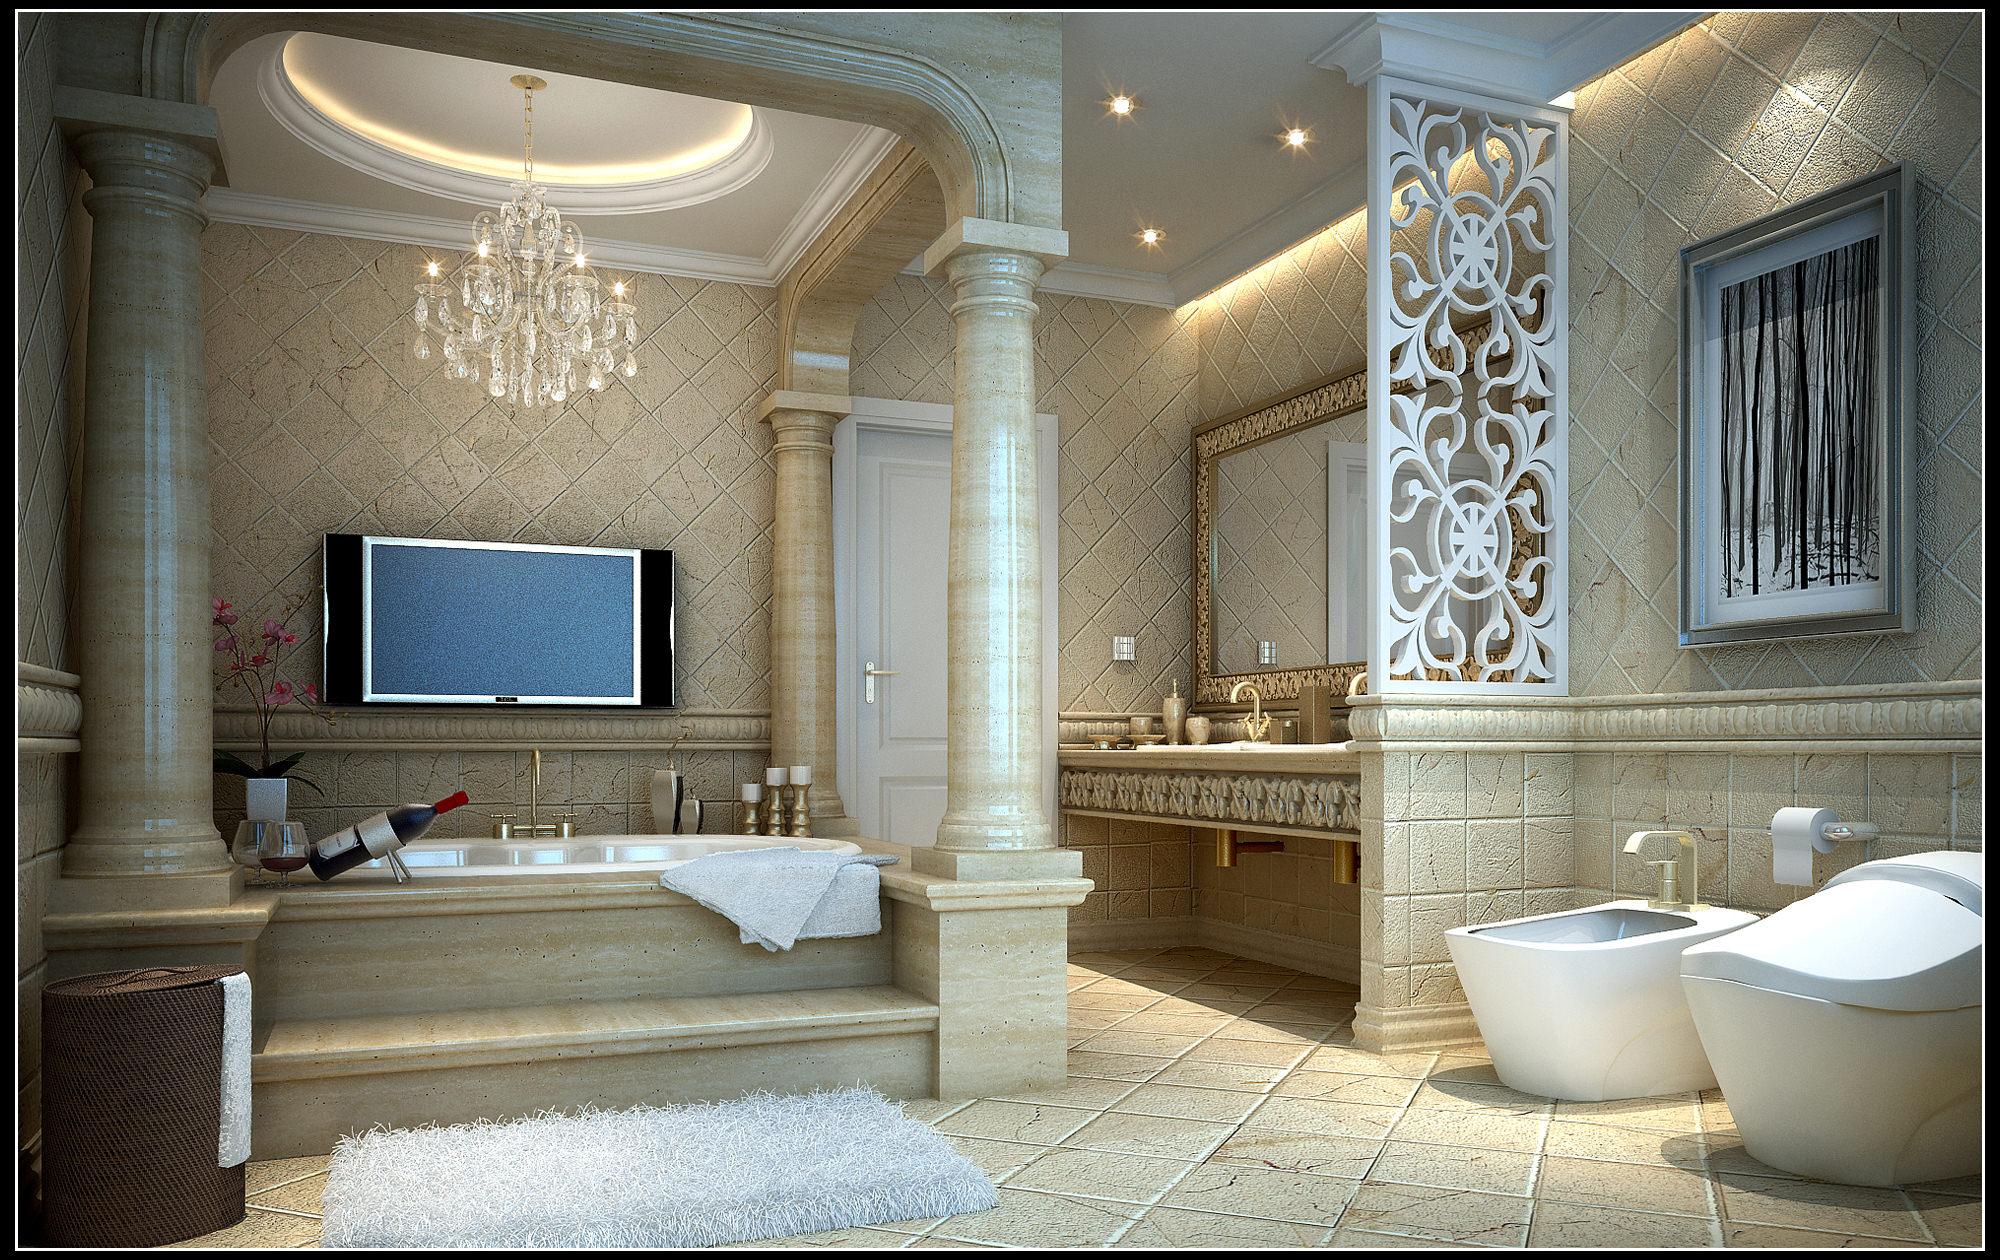 Collection Modern Bathroom Fully Furnished Collection 3d Model Max Bathroom Model Bathroom Liners Bathroom Models